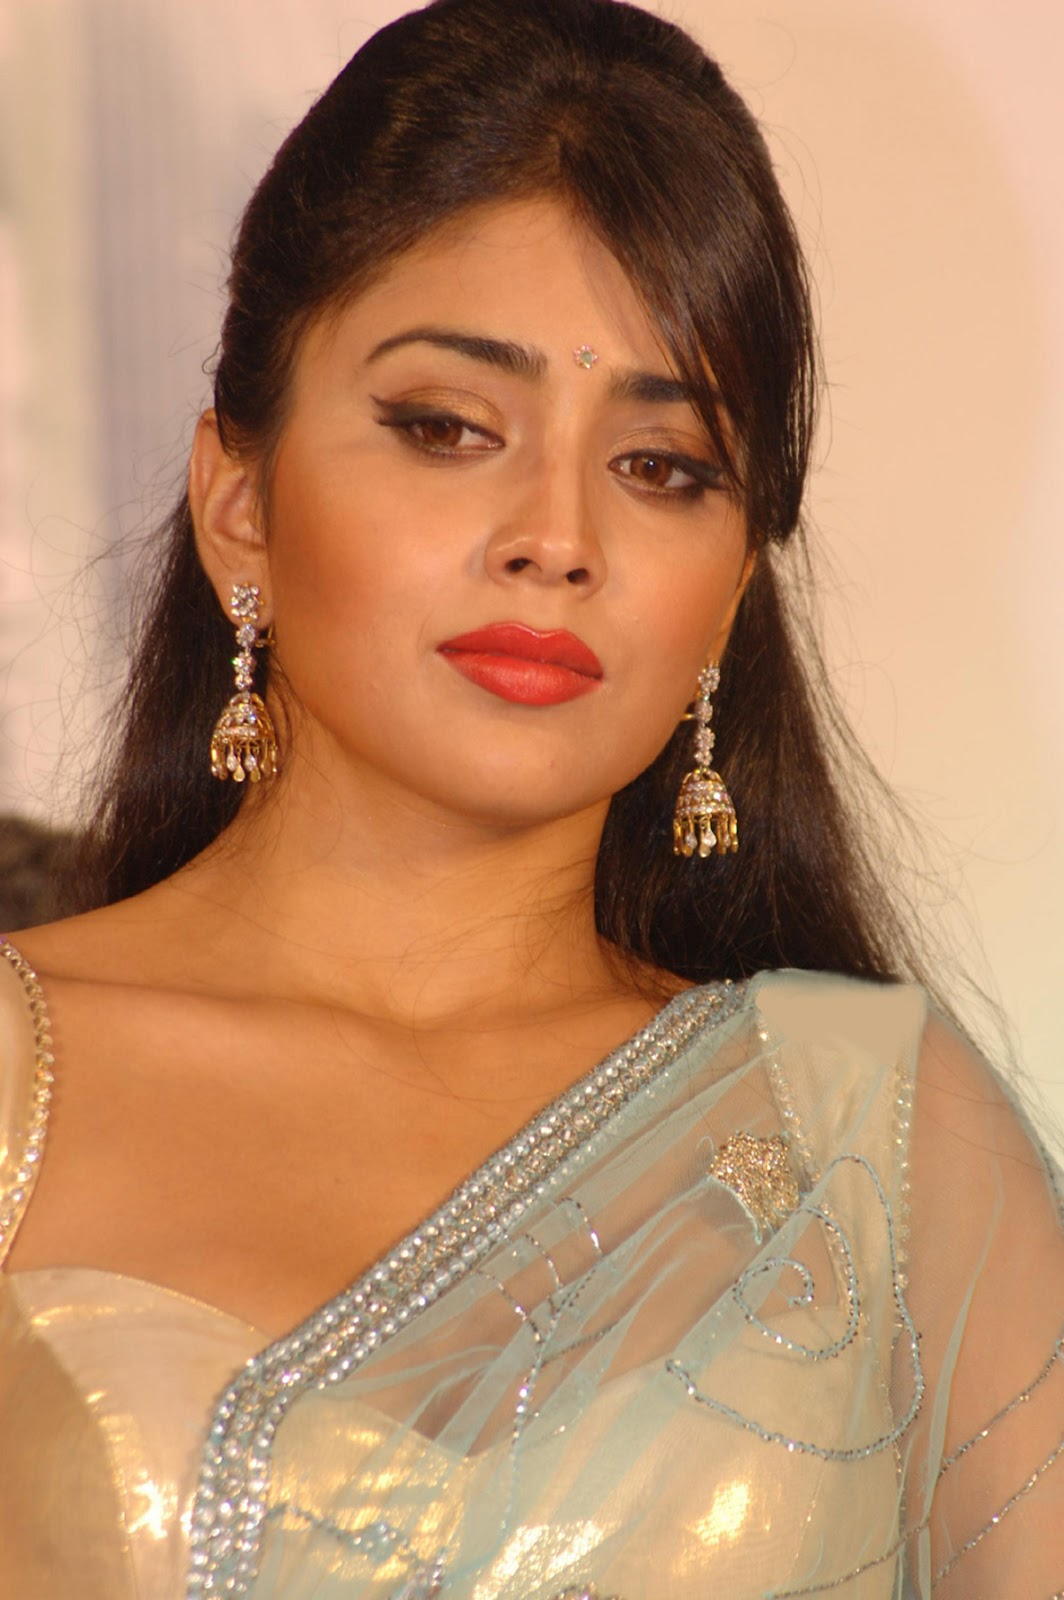 Shriya Saran Bollywood Actress New Pictures, Images (High